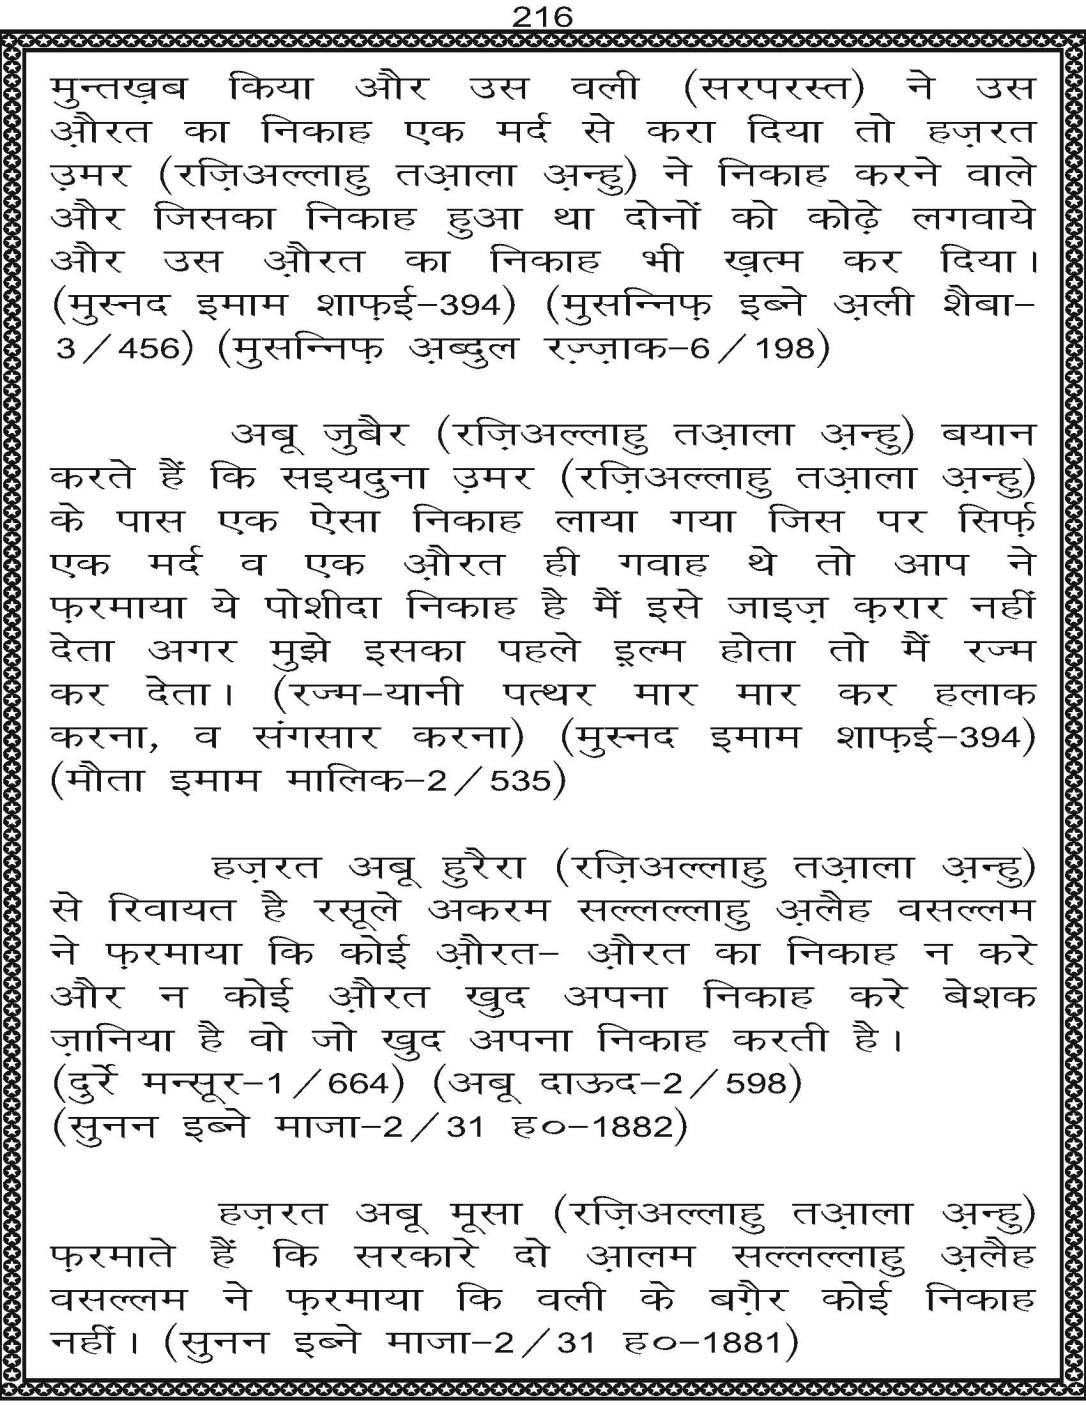 AzmateTaziyadari_Page_216